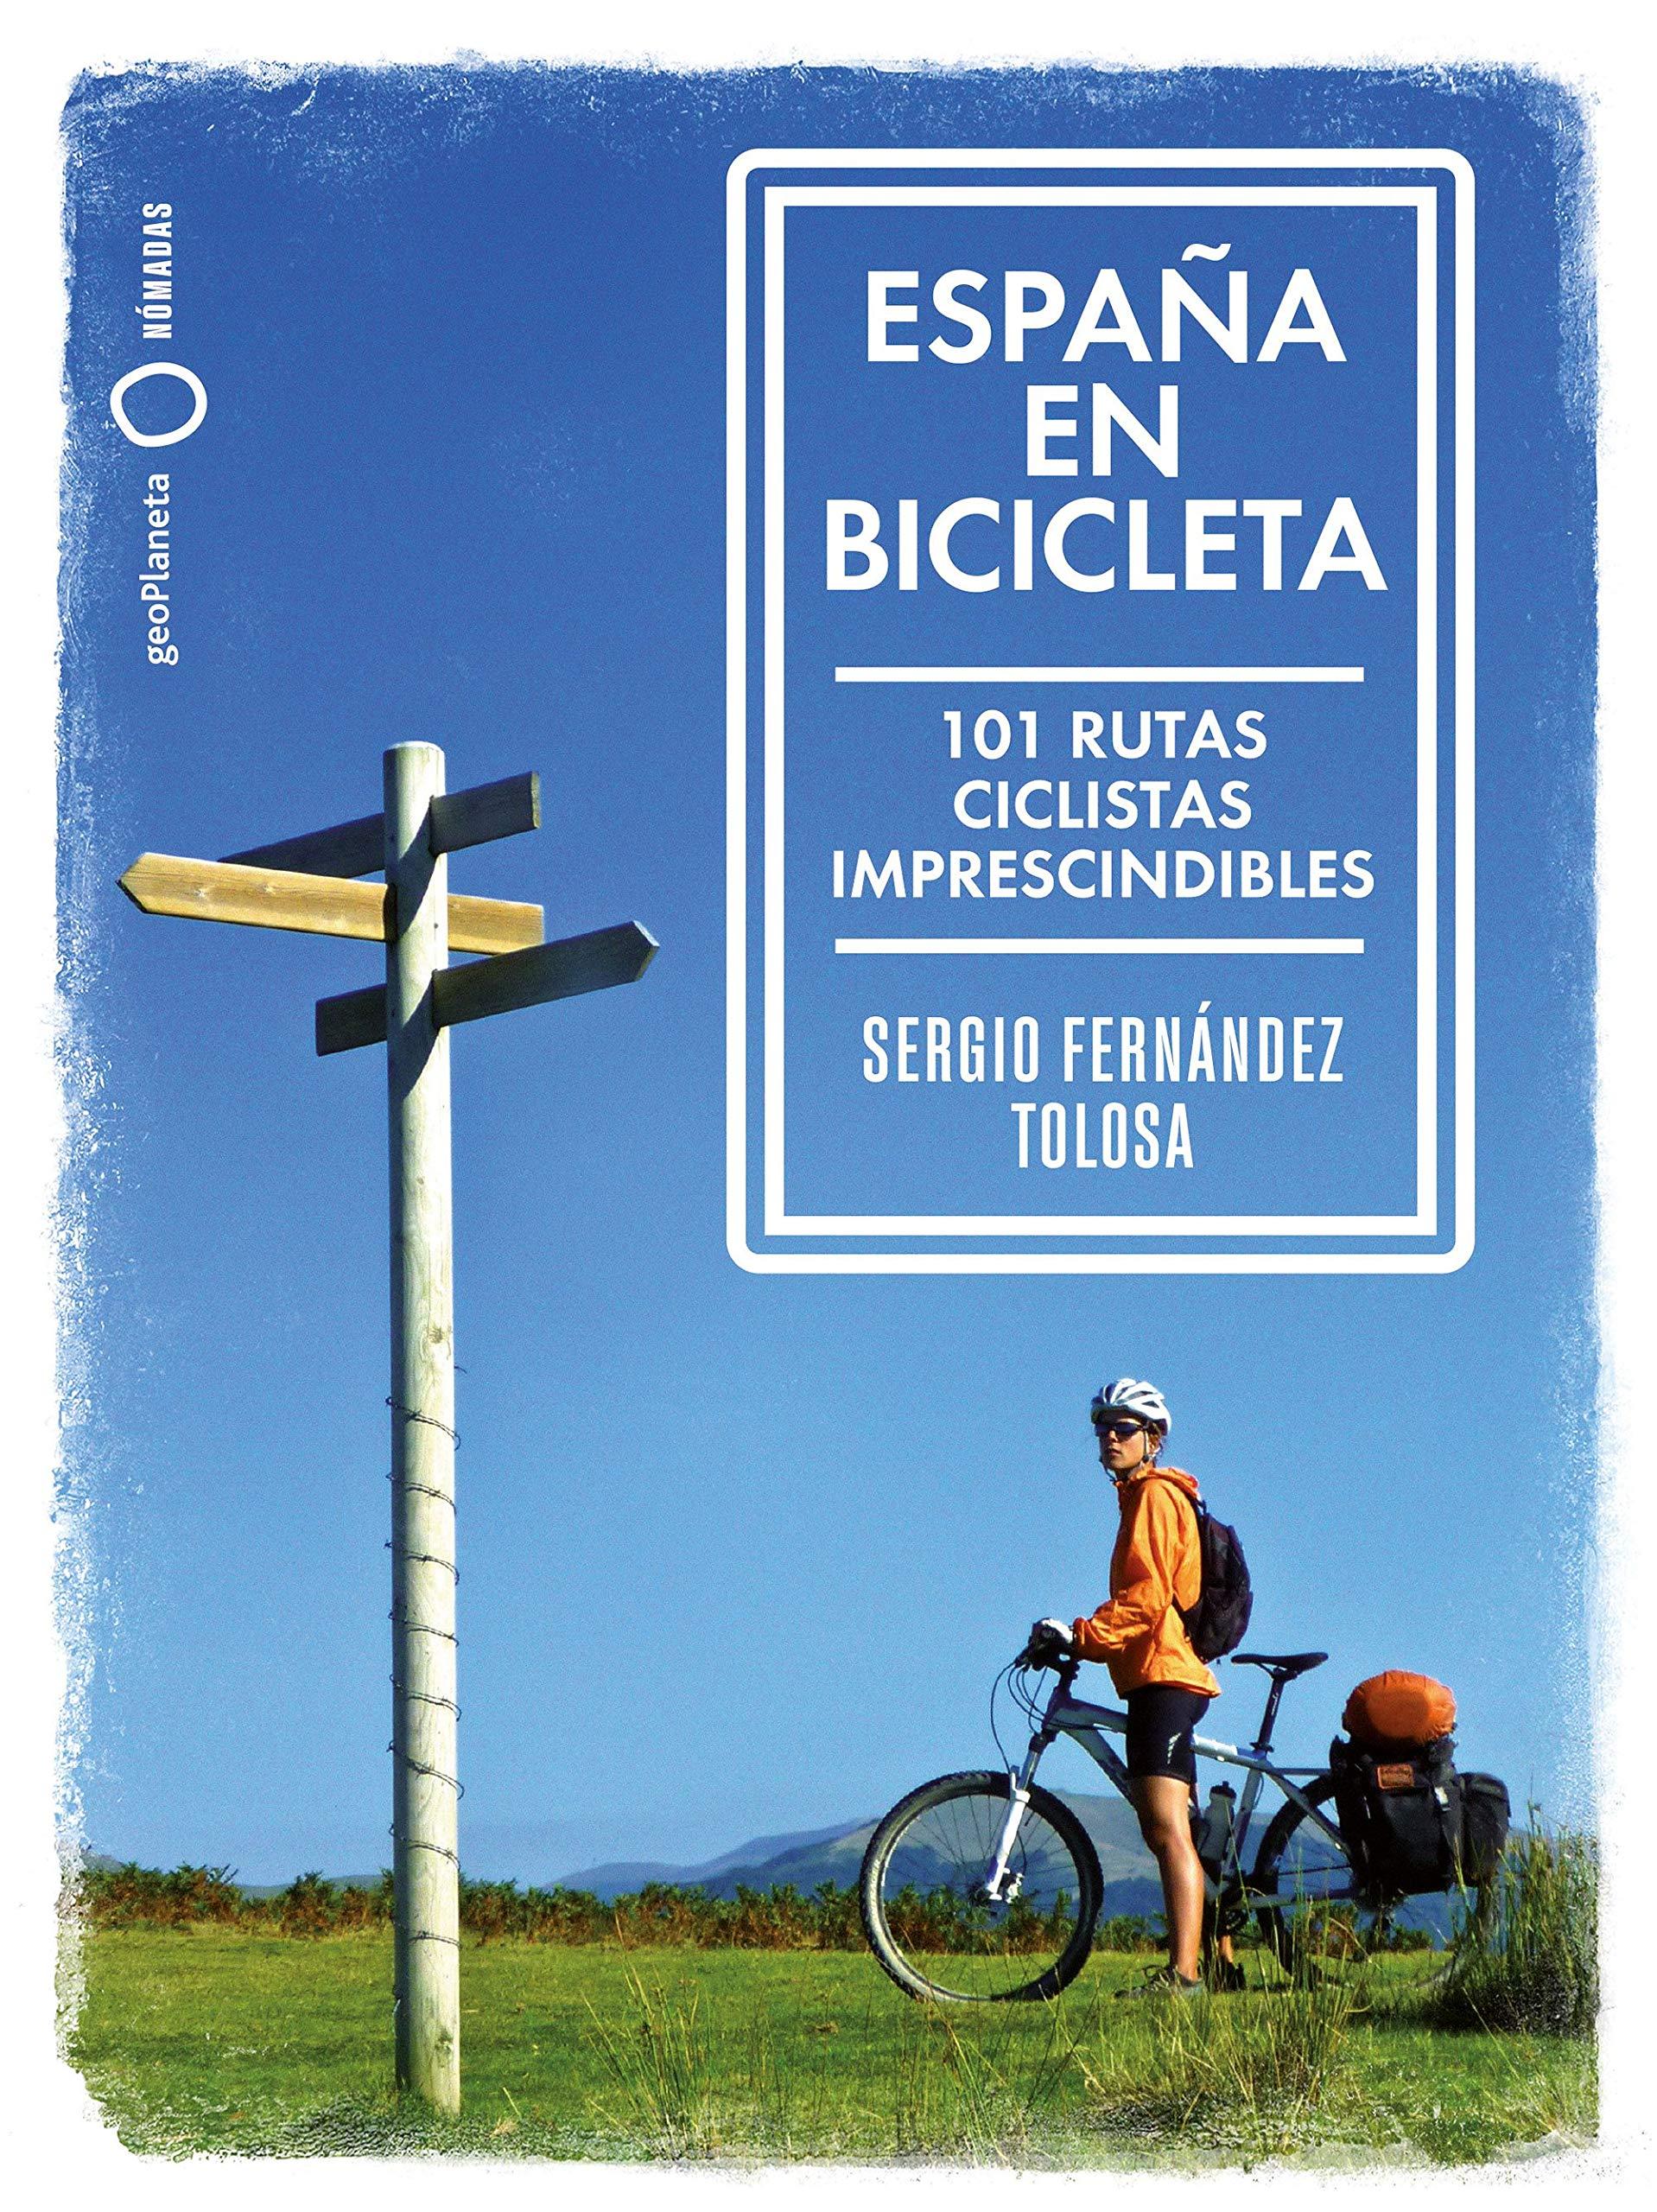 España en bicicleta (Nómadas): Amazon.es: Fernández Tolosa, Sergio ...